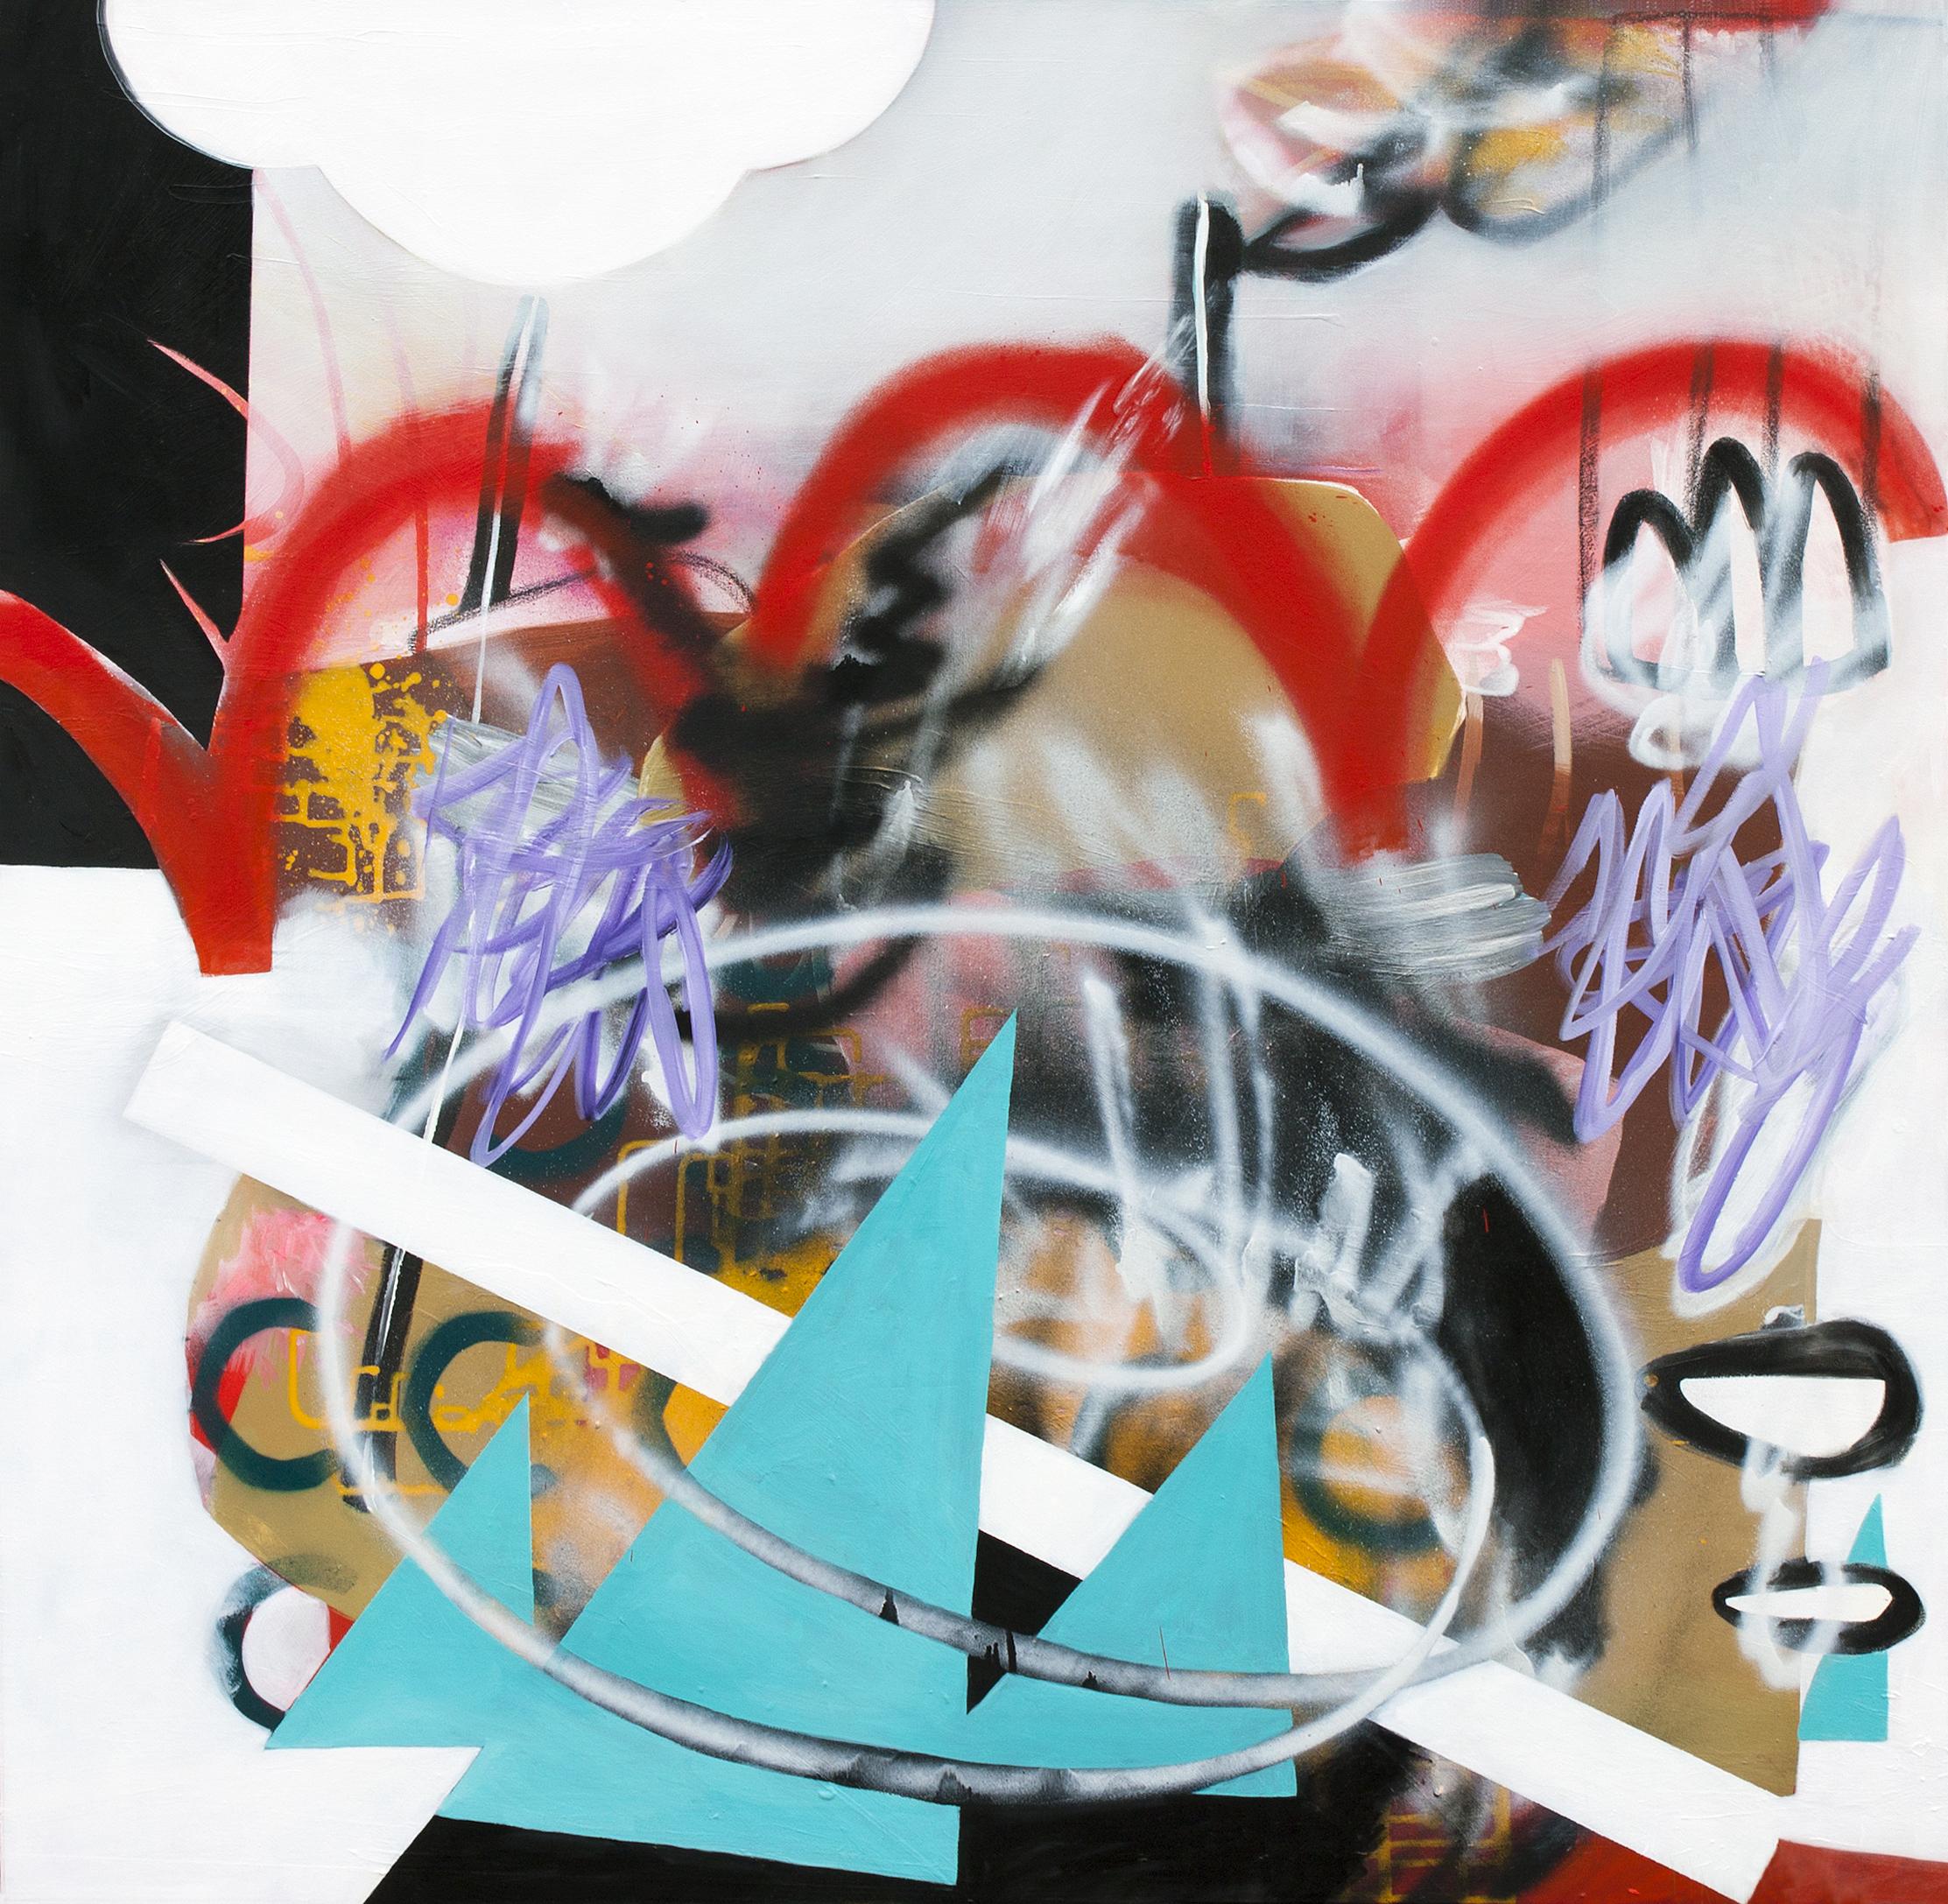 "Amplifier 2013, oil on canvas, 48"" x 48"""